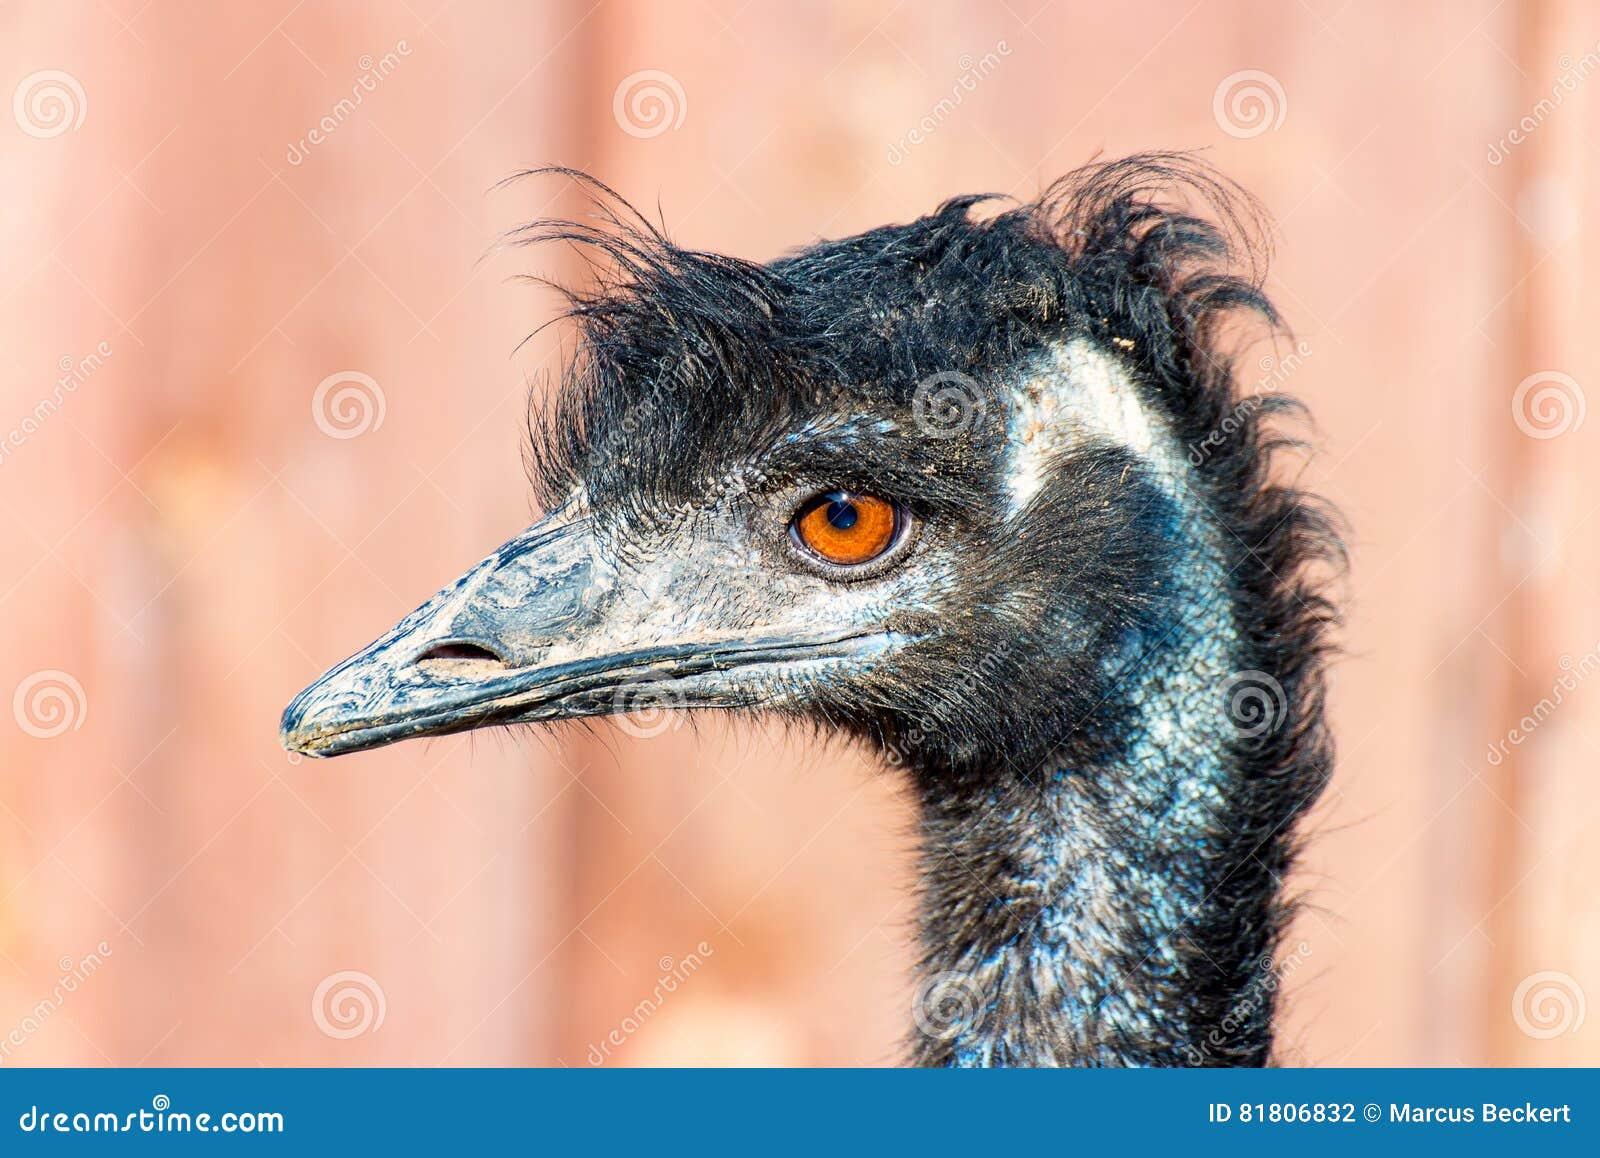 Голова птицы 2 эму